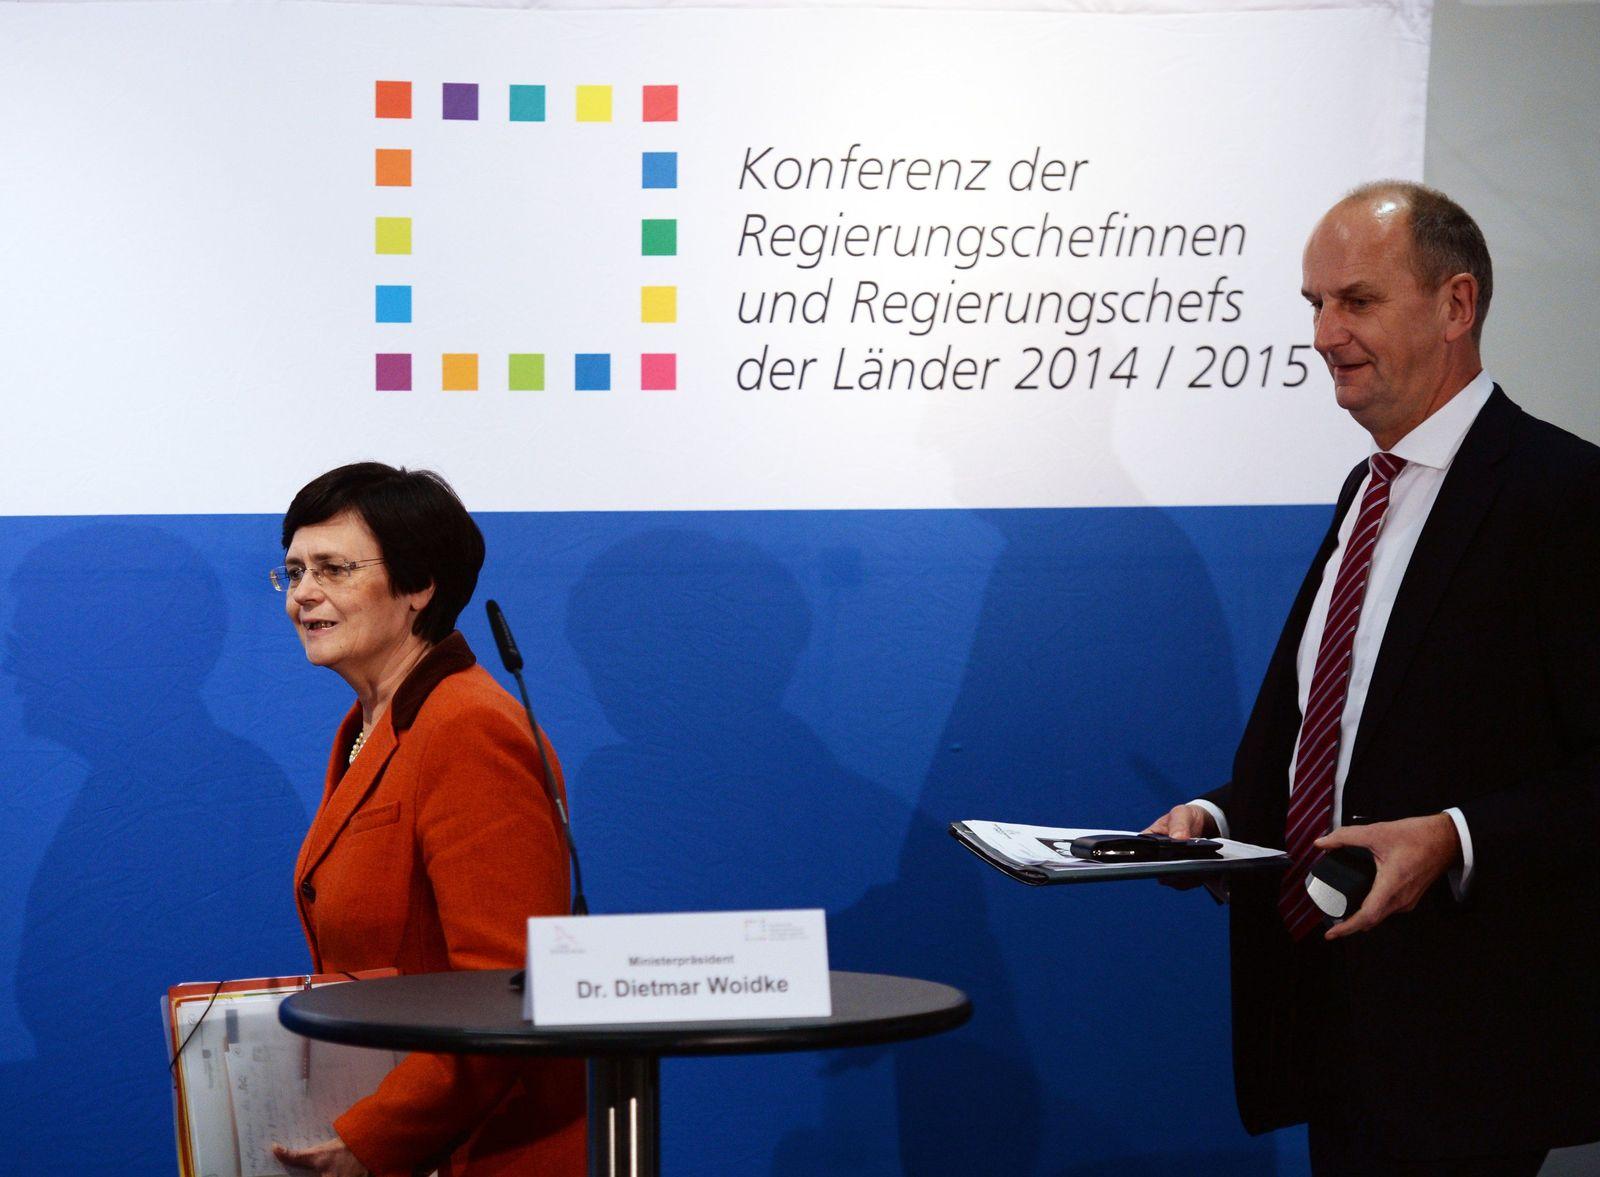 Ministerpräsidentenkonferenz in Potsdam